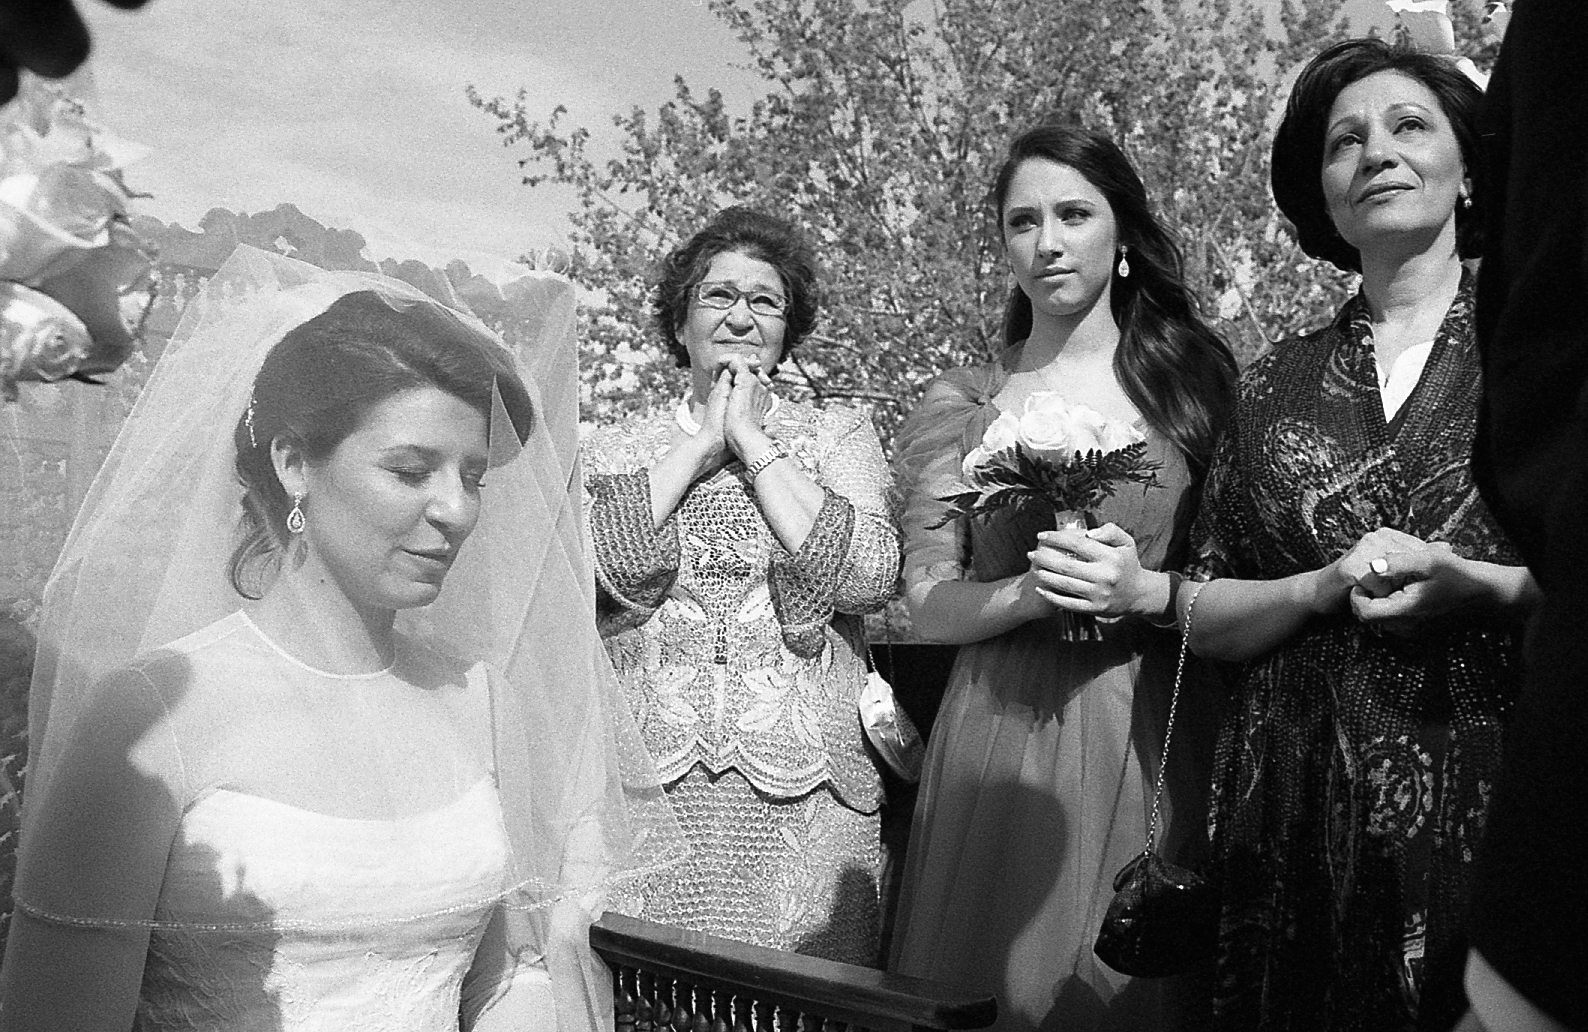 New-York-City-Hasidic-Jewish-Wedding-Manhattan-Beach-NYC-Photojournalistic-Wedding-Photography-Jacek-Dolata-35mm-medium-format-film-5.jpg